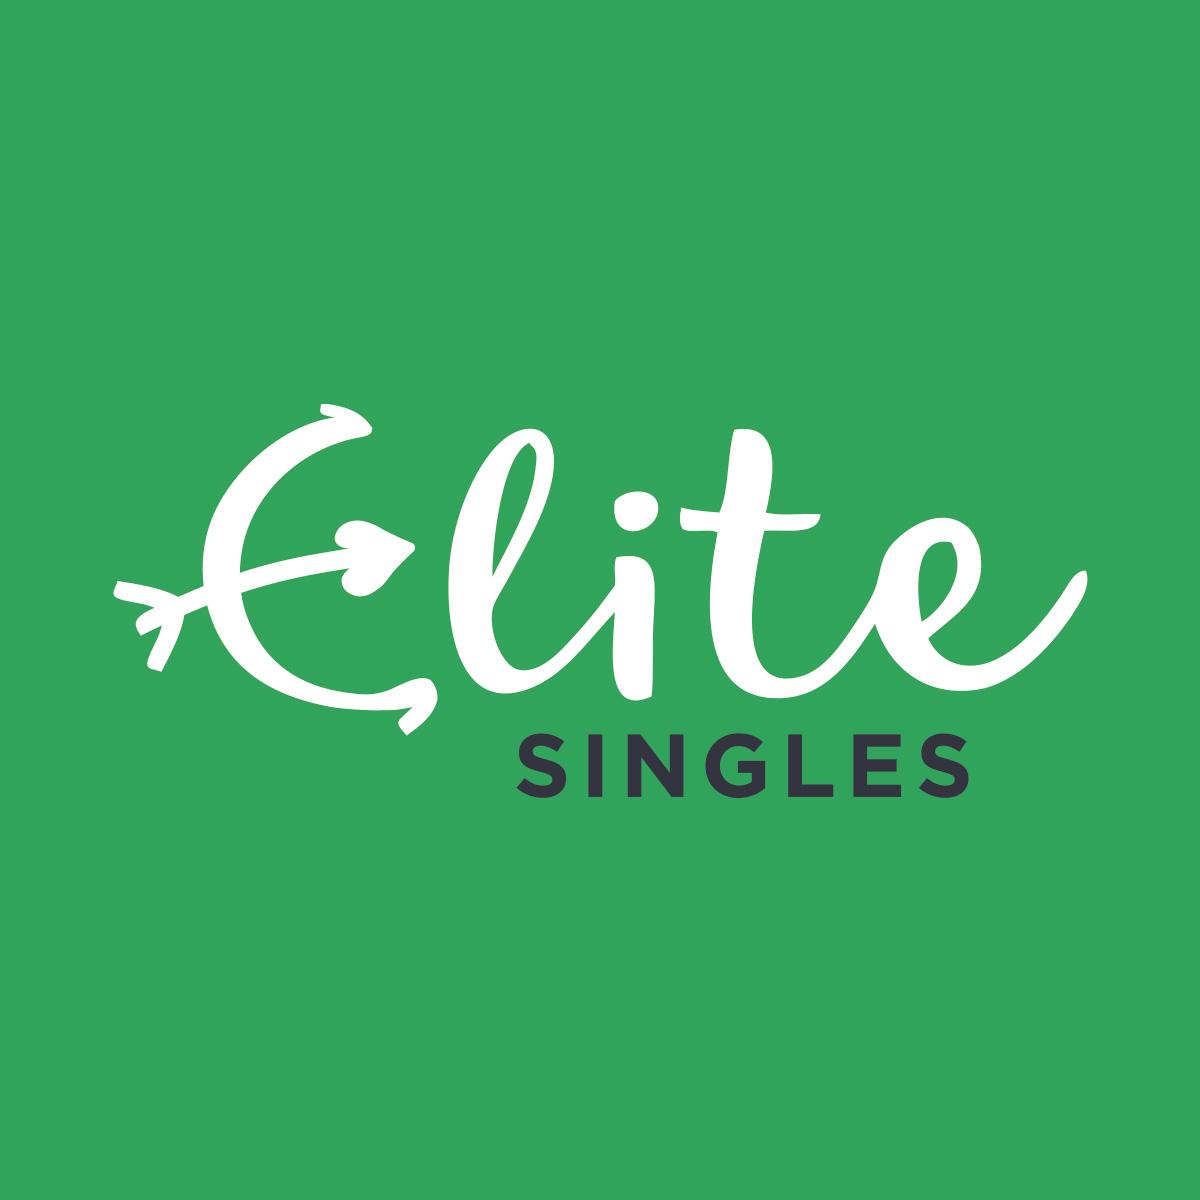 Toronto elite dating service Elite dating